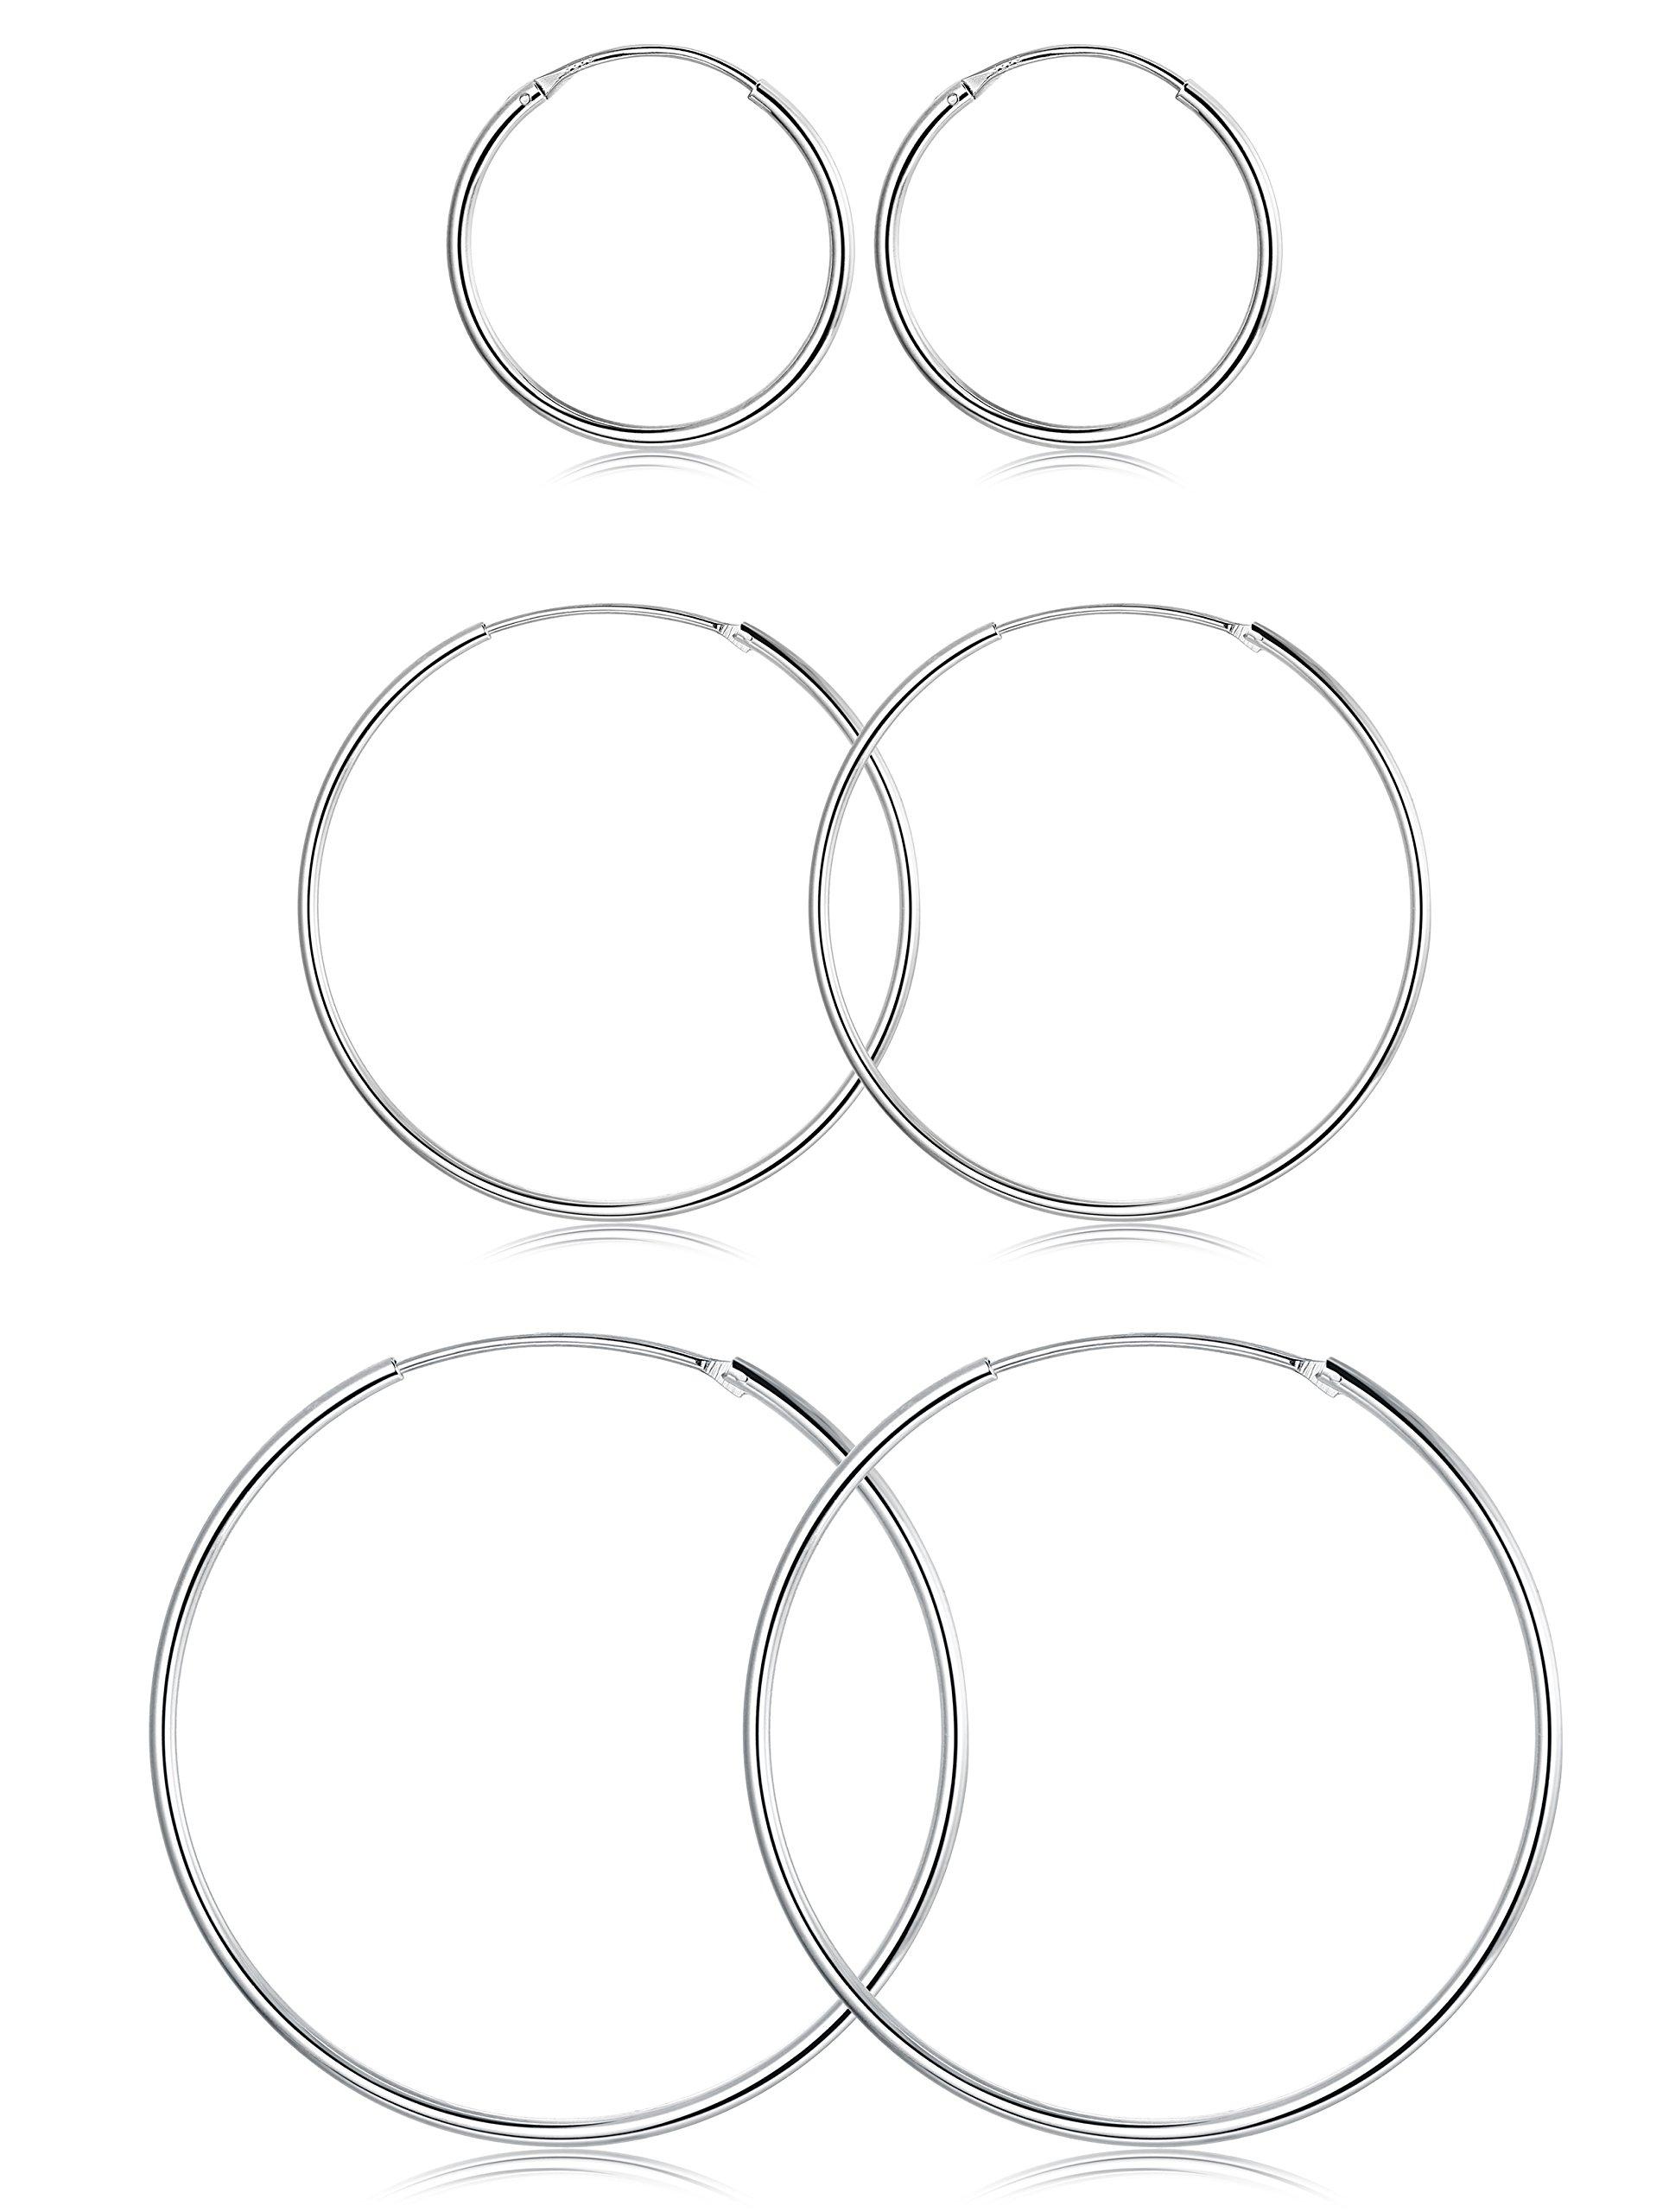 FUNRUN JEWELRY 3 Pairs Sterling Silver Hoop Earrings for Women Men Round Earrings Set 10-40MM (B: Platinum-Plated 3 Pairs: 20MM/30MM/40MM) by FUNRUN JEWELRY (Image #1)